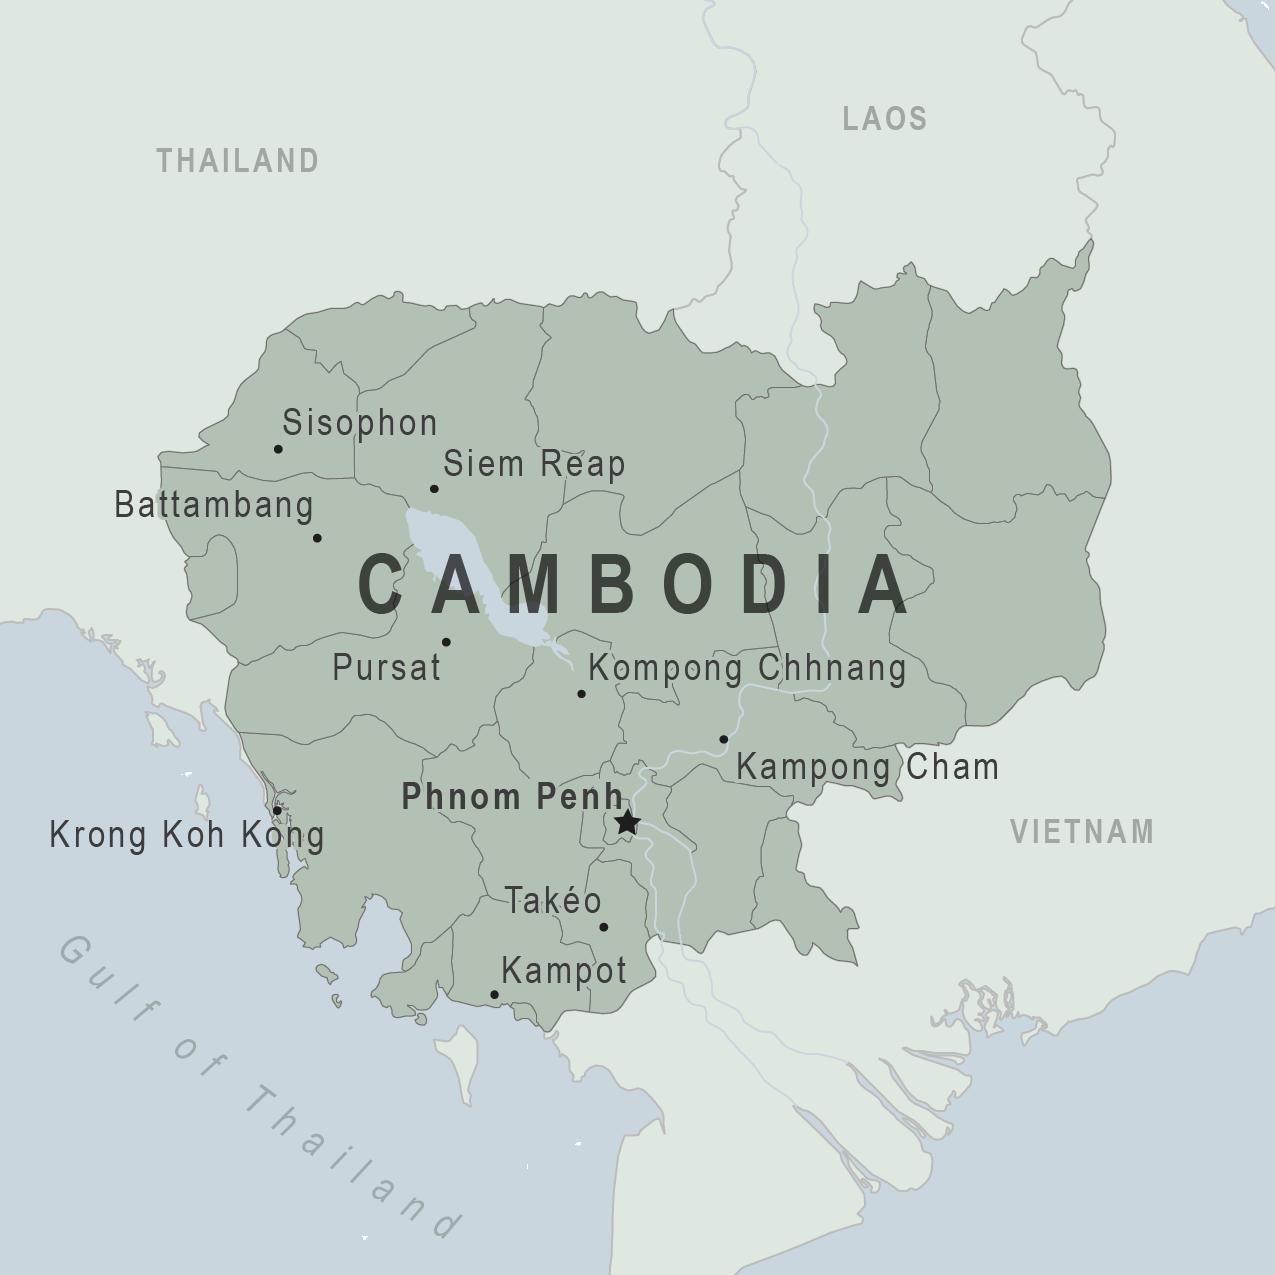 cambodia on the map Cambodia Traveler View Travelers Health Cdc cambodia on the map